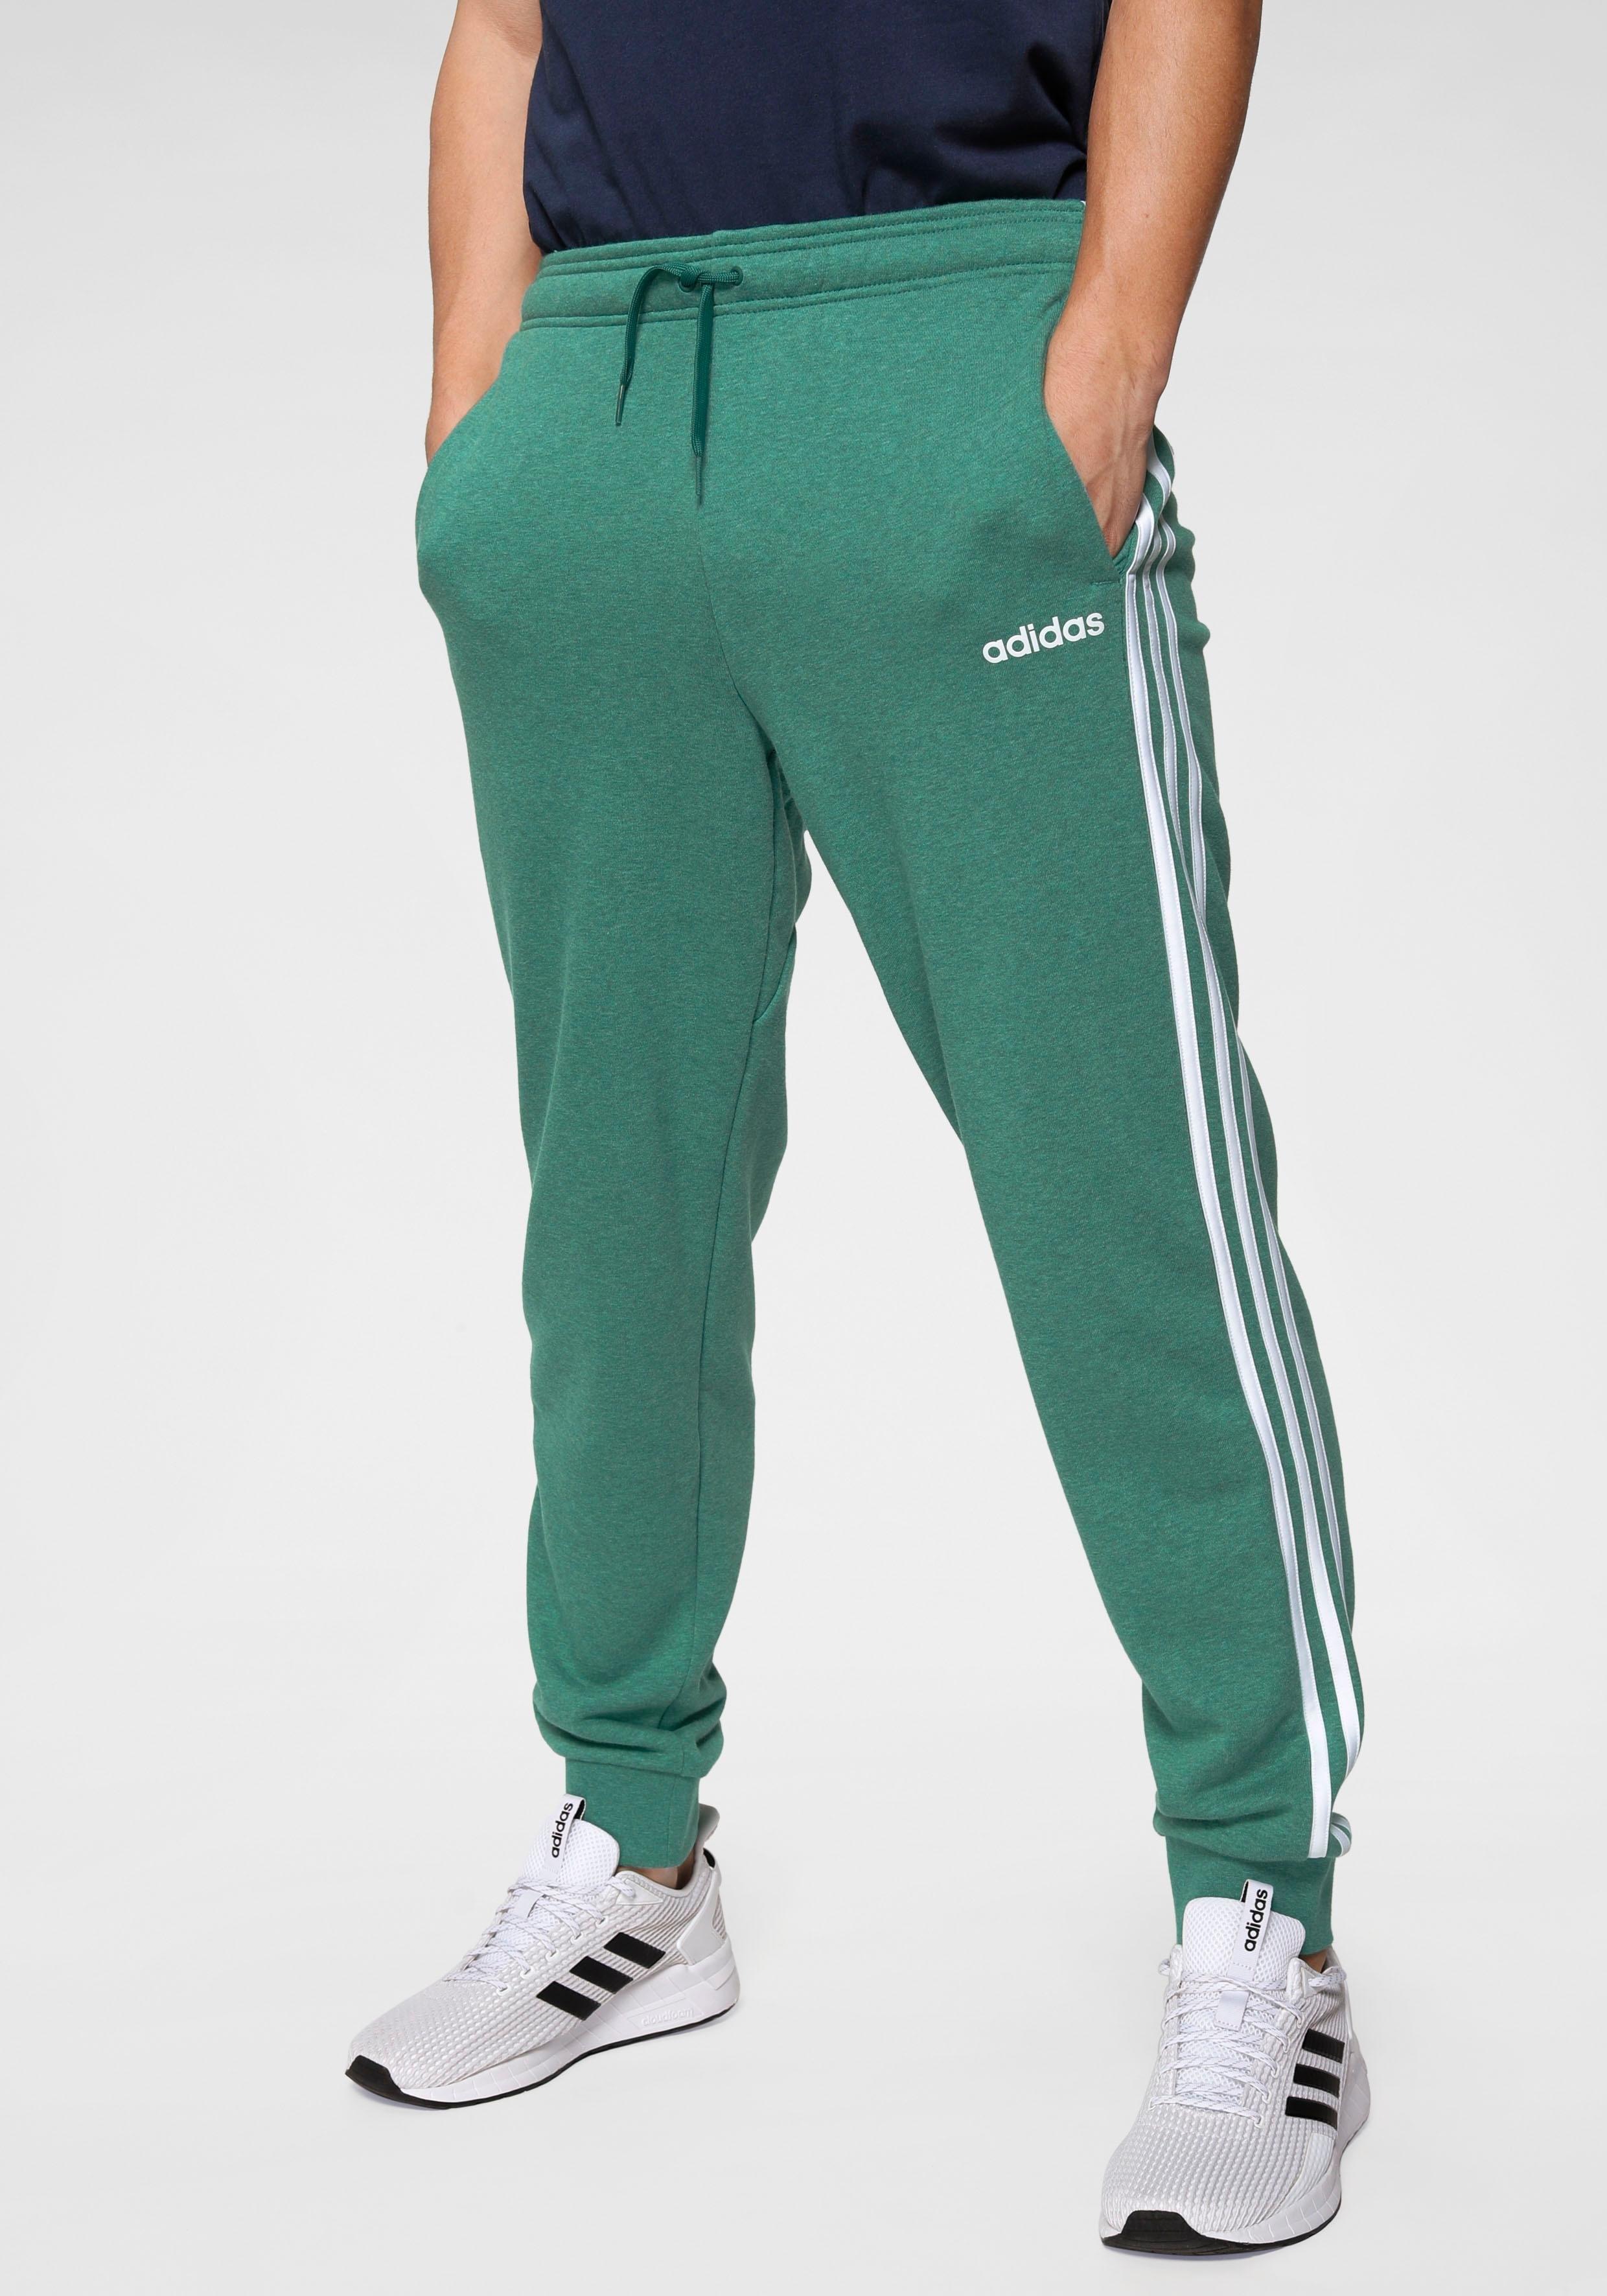 adidas Performance adidas joggingbroek »E 2STRIPES T PANT FT« voordelig en veilig online kopen